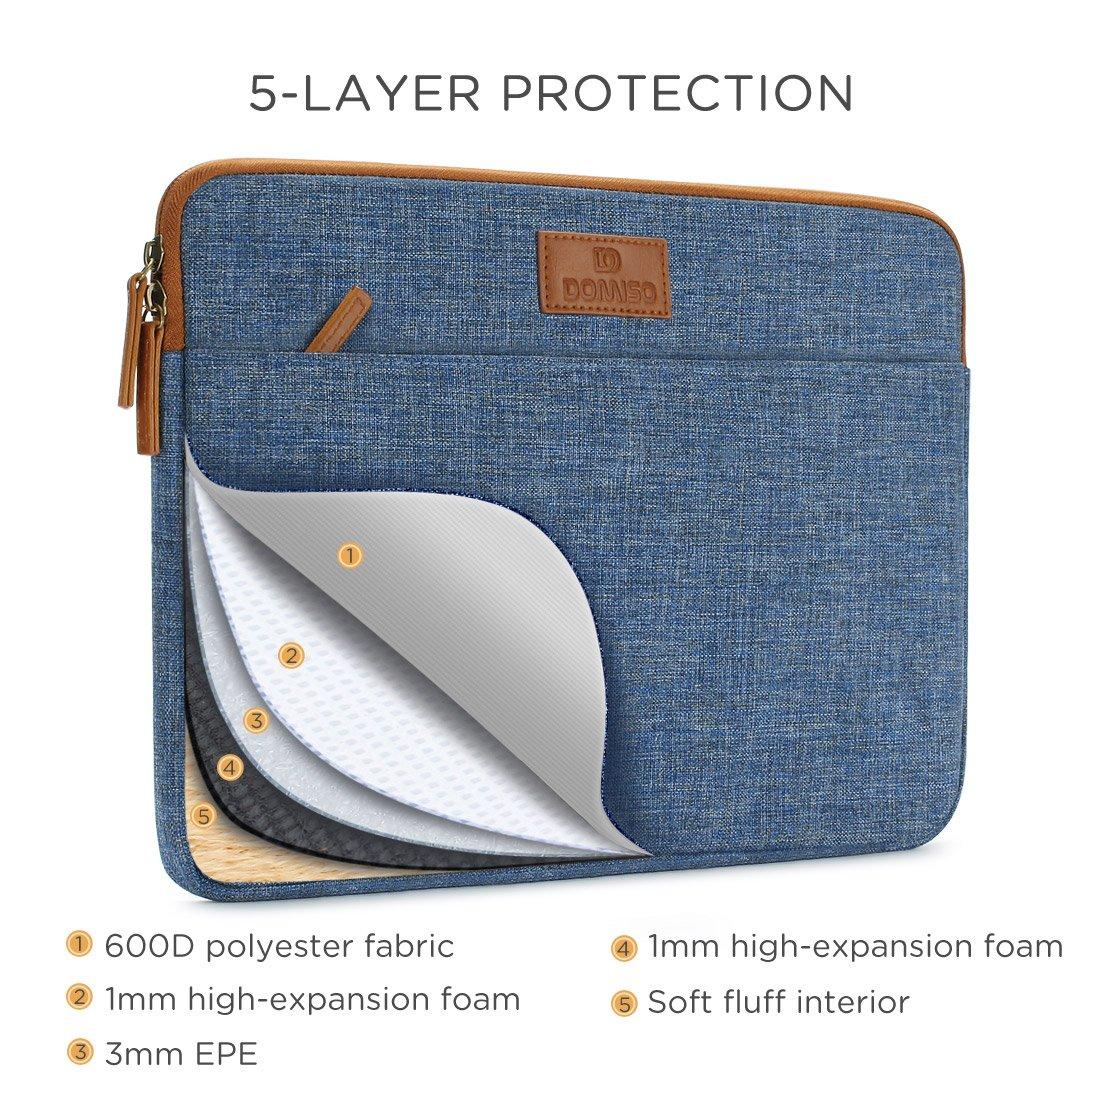 DOMISO 13-13.3 Pollici Morbide Sleeve Case Protettiva per Notebook Classico Comfort Caso Laptop Sleeve Protettore Copertina Borsa Marsupio per 13 MacBook Air 13.5 Microsoft Surface Book Blu